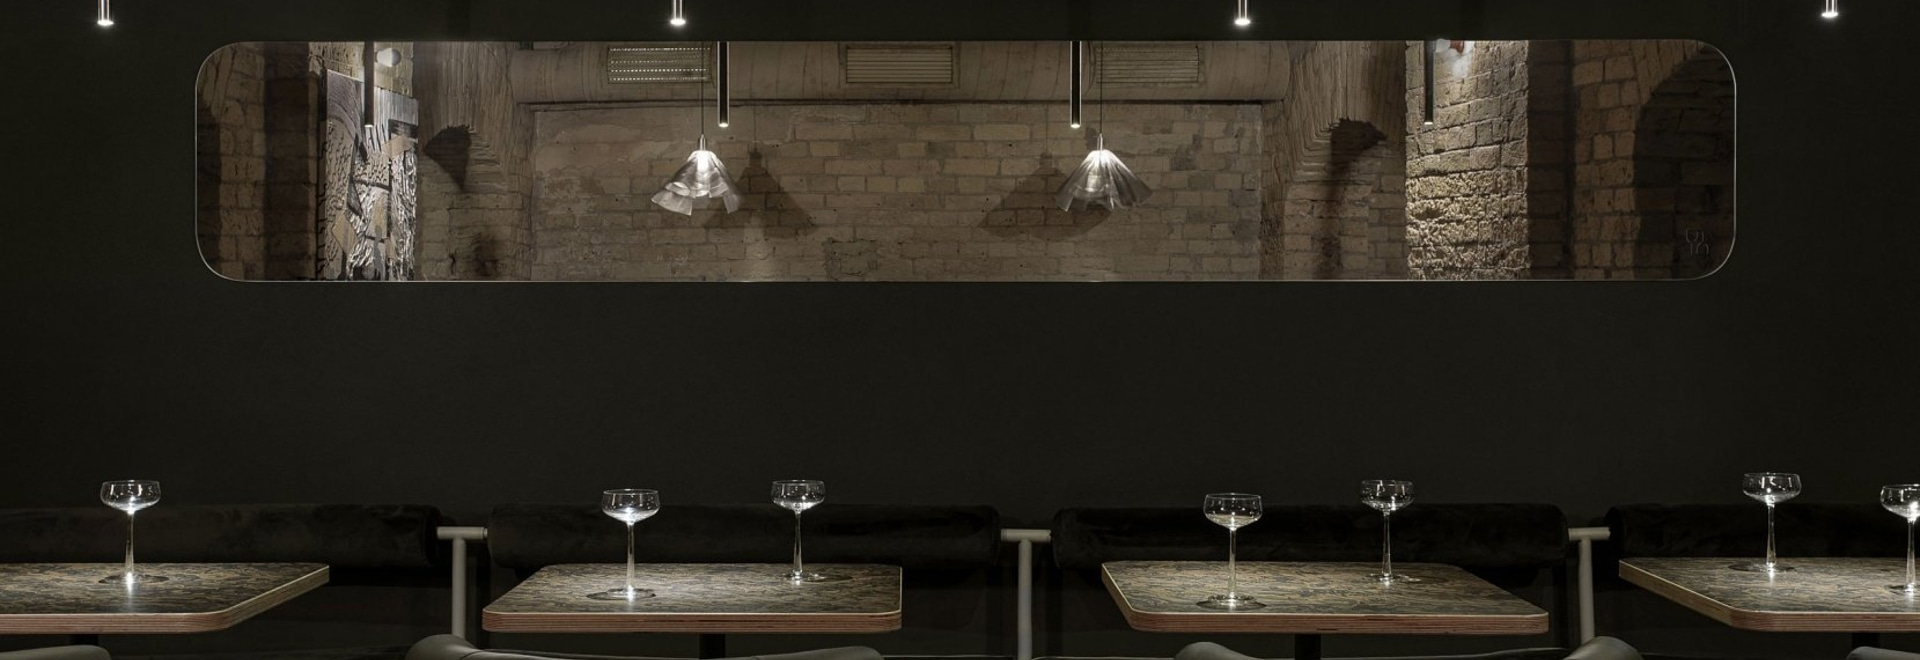 Il fascino sotterraneo di Balthazar Wine Bar a Kiev